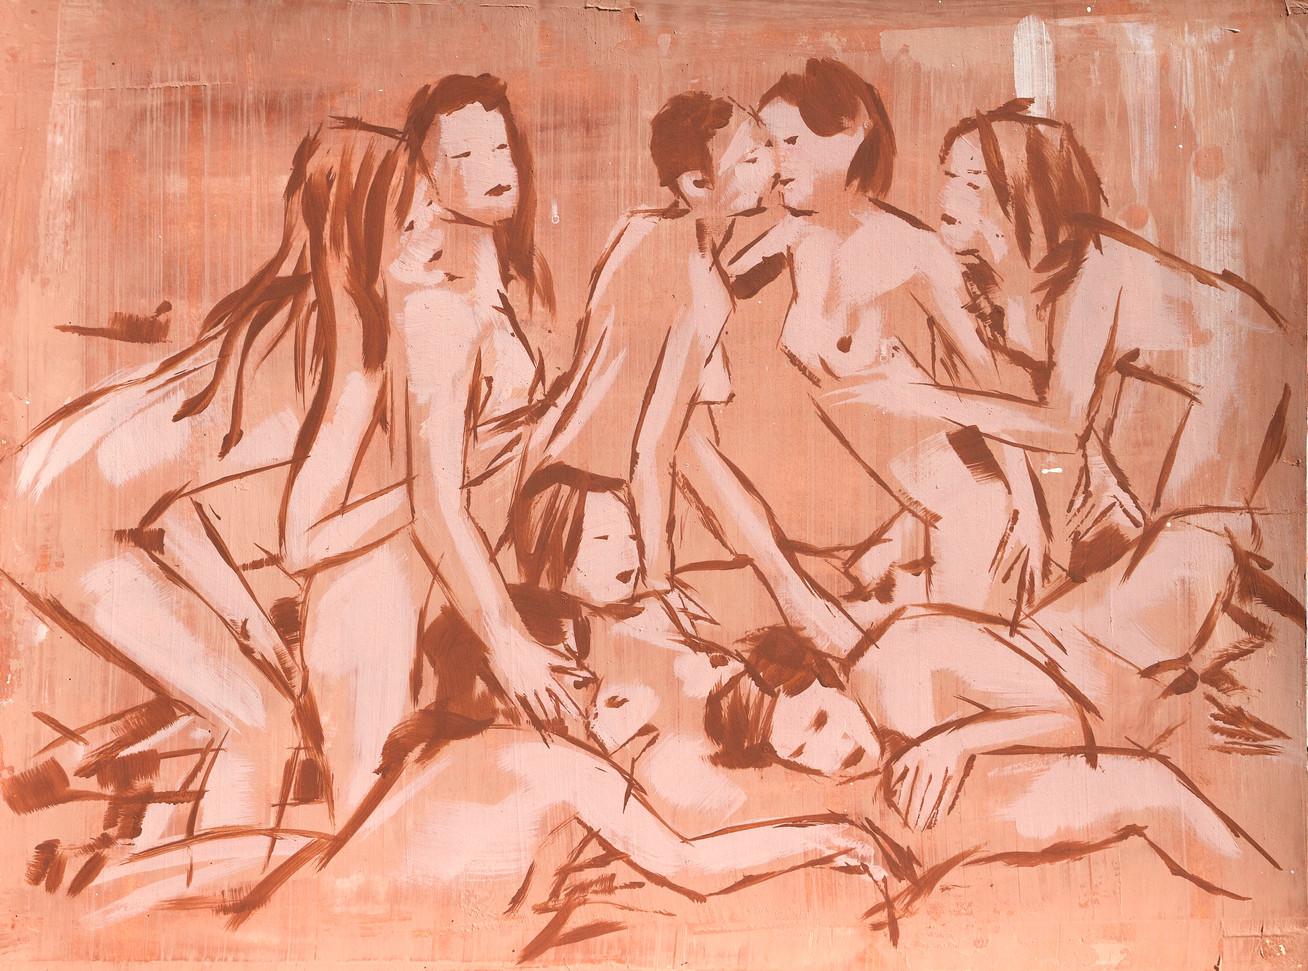 The End of Seduction - 60 x 80 cm - acry